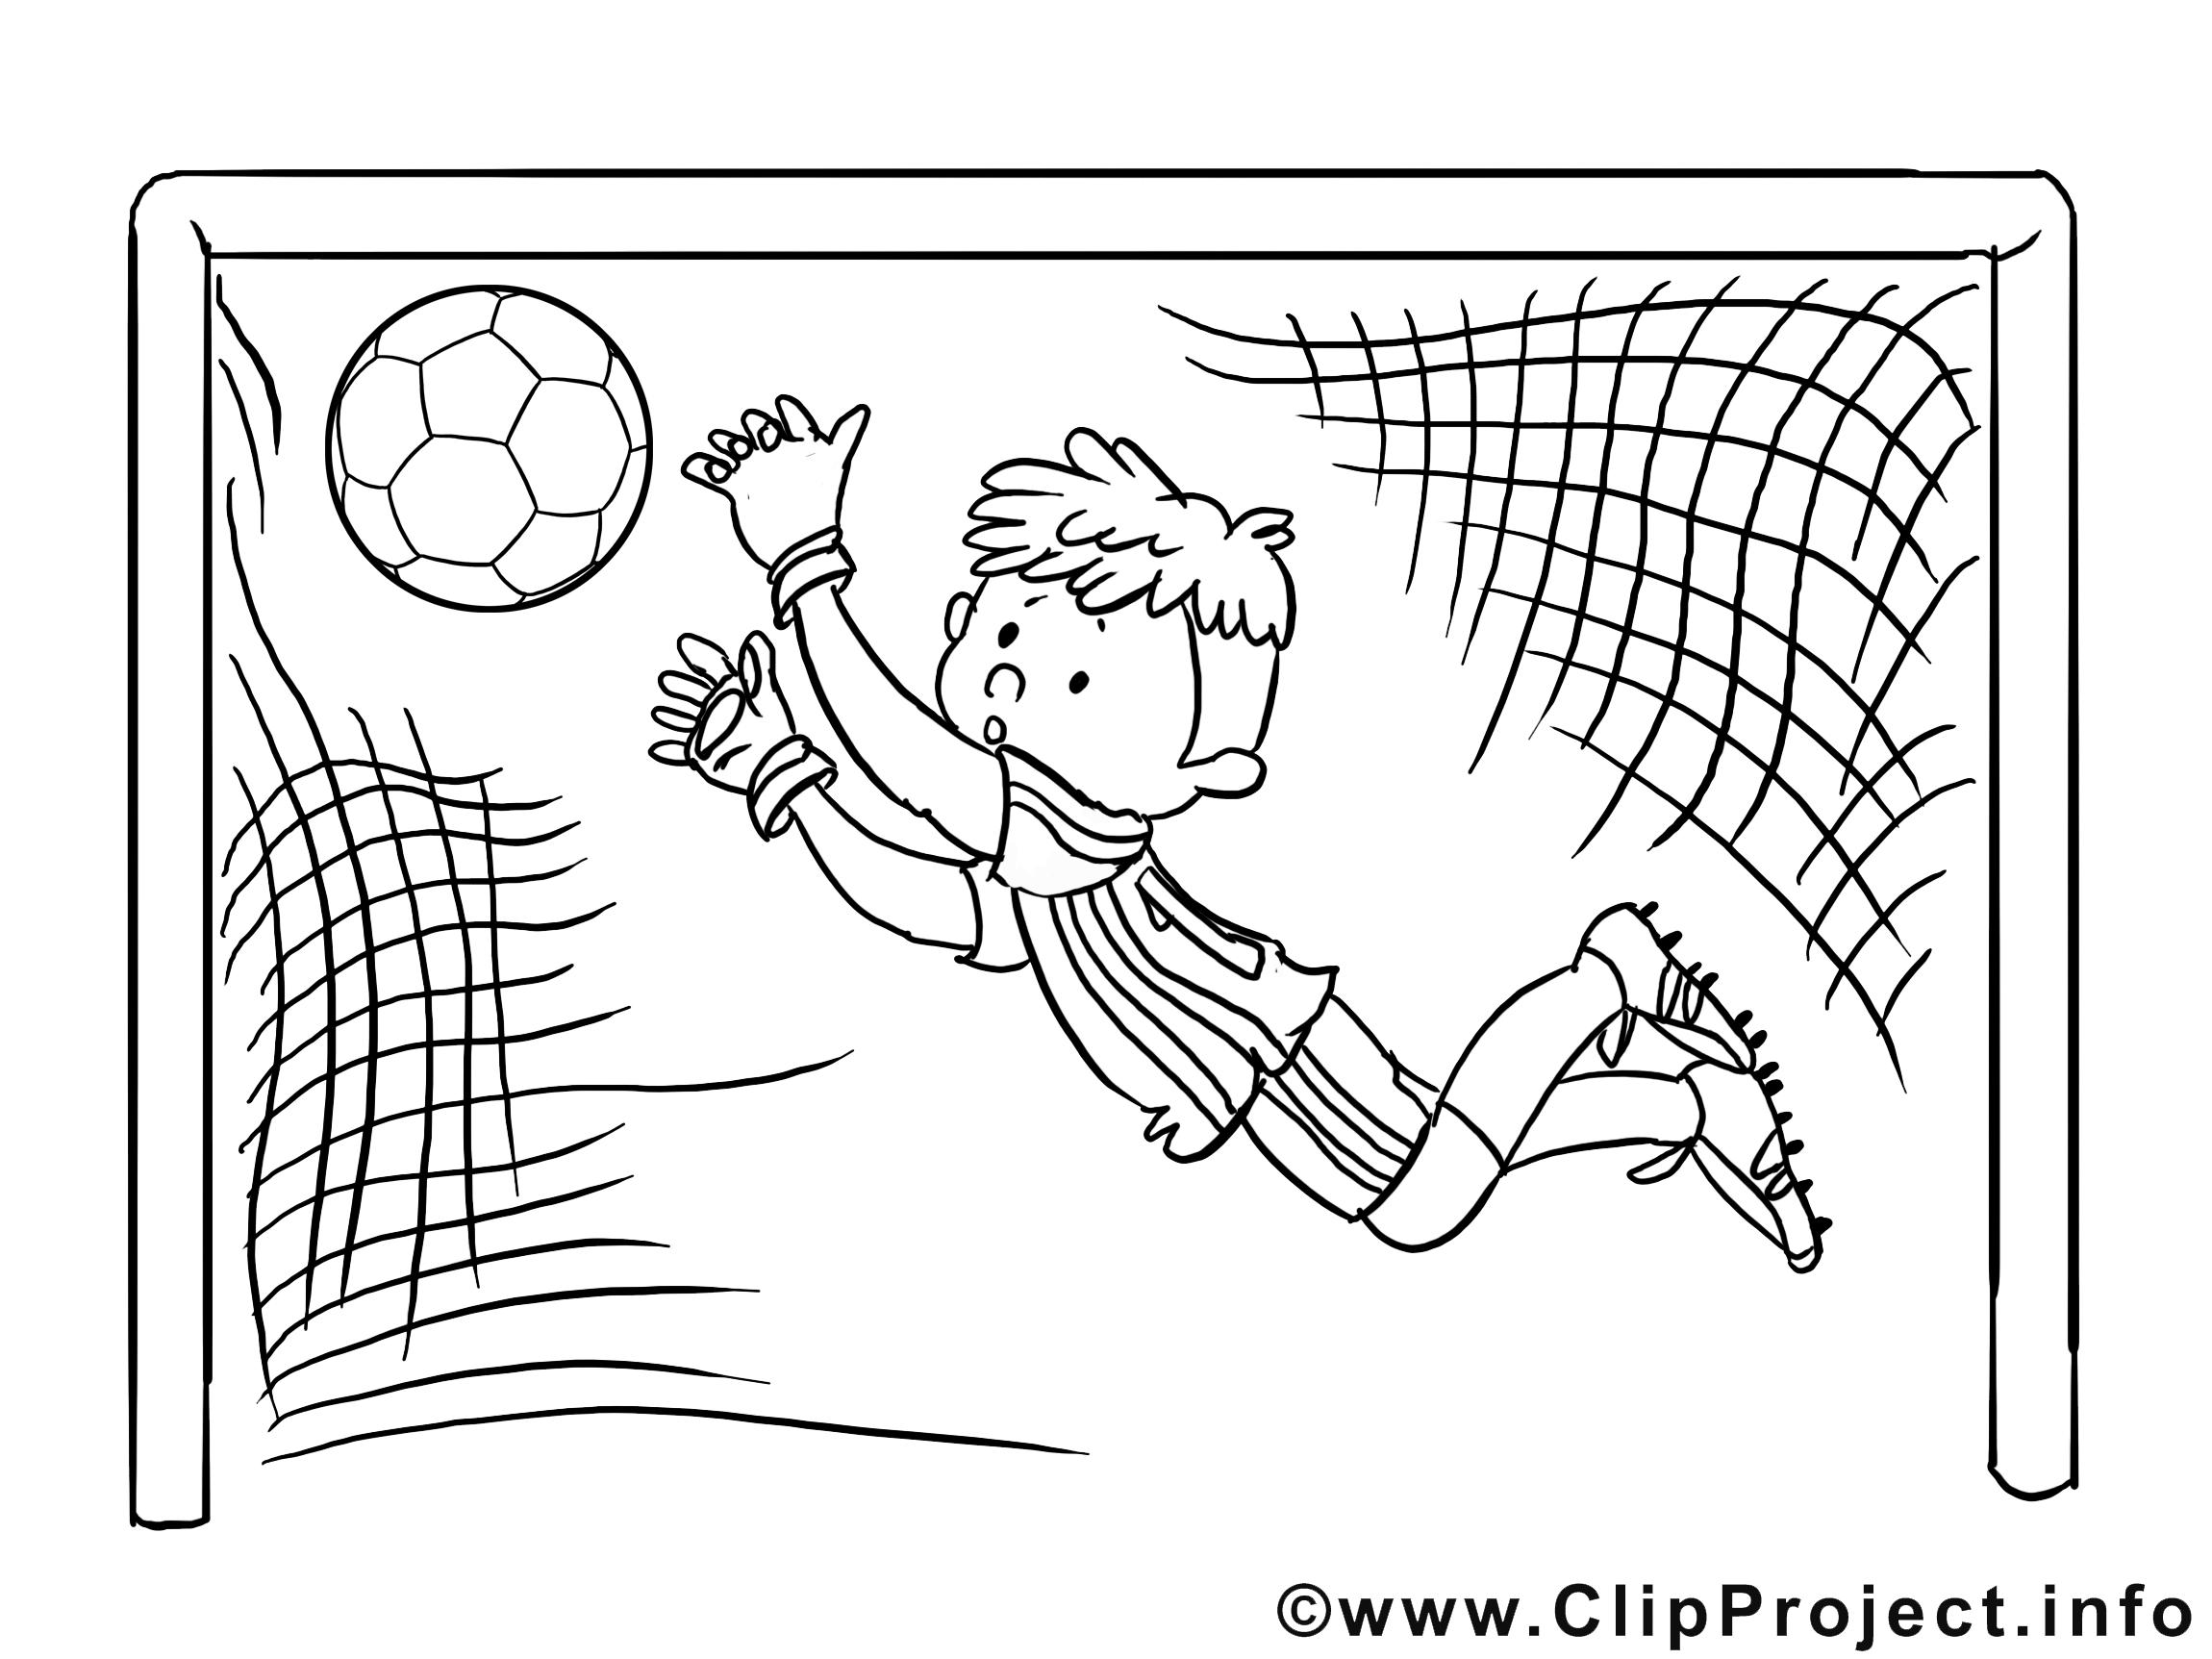 Goal image gratuite – Football à imprimer